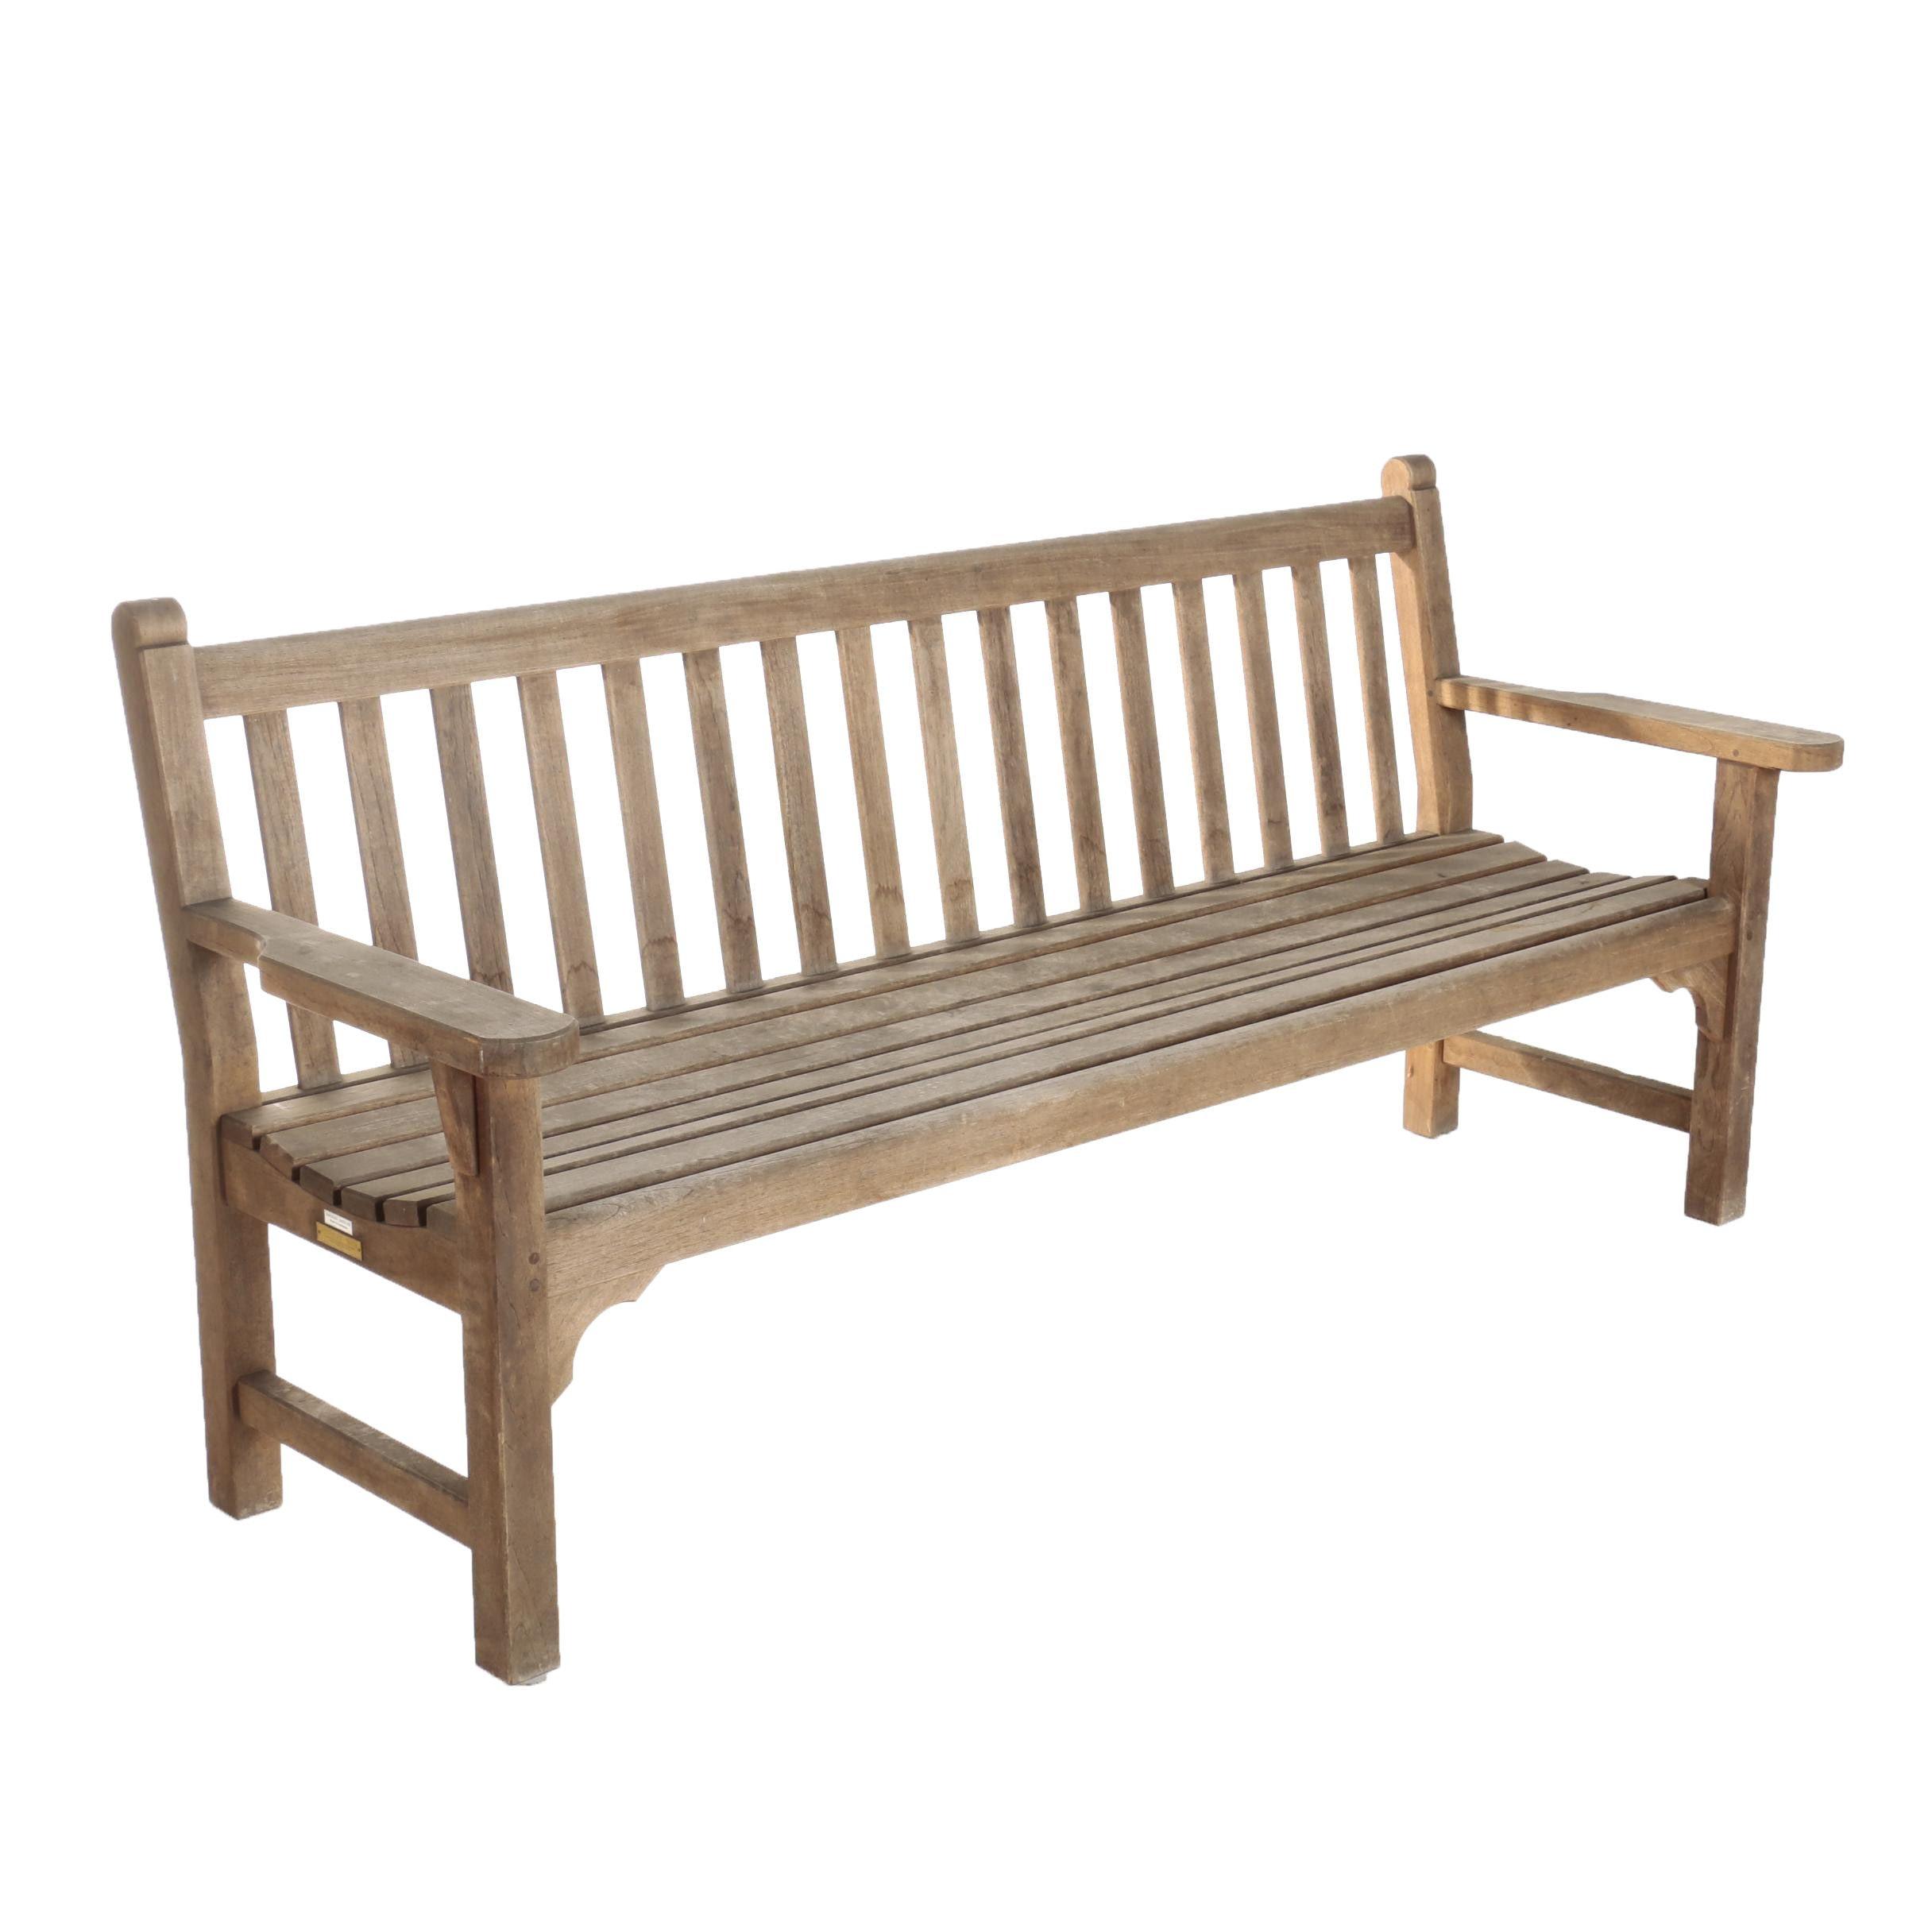 Kingsley-Bate Hyde Park Teak Garden Bench